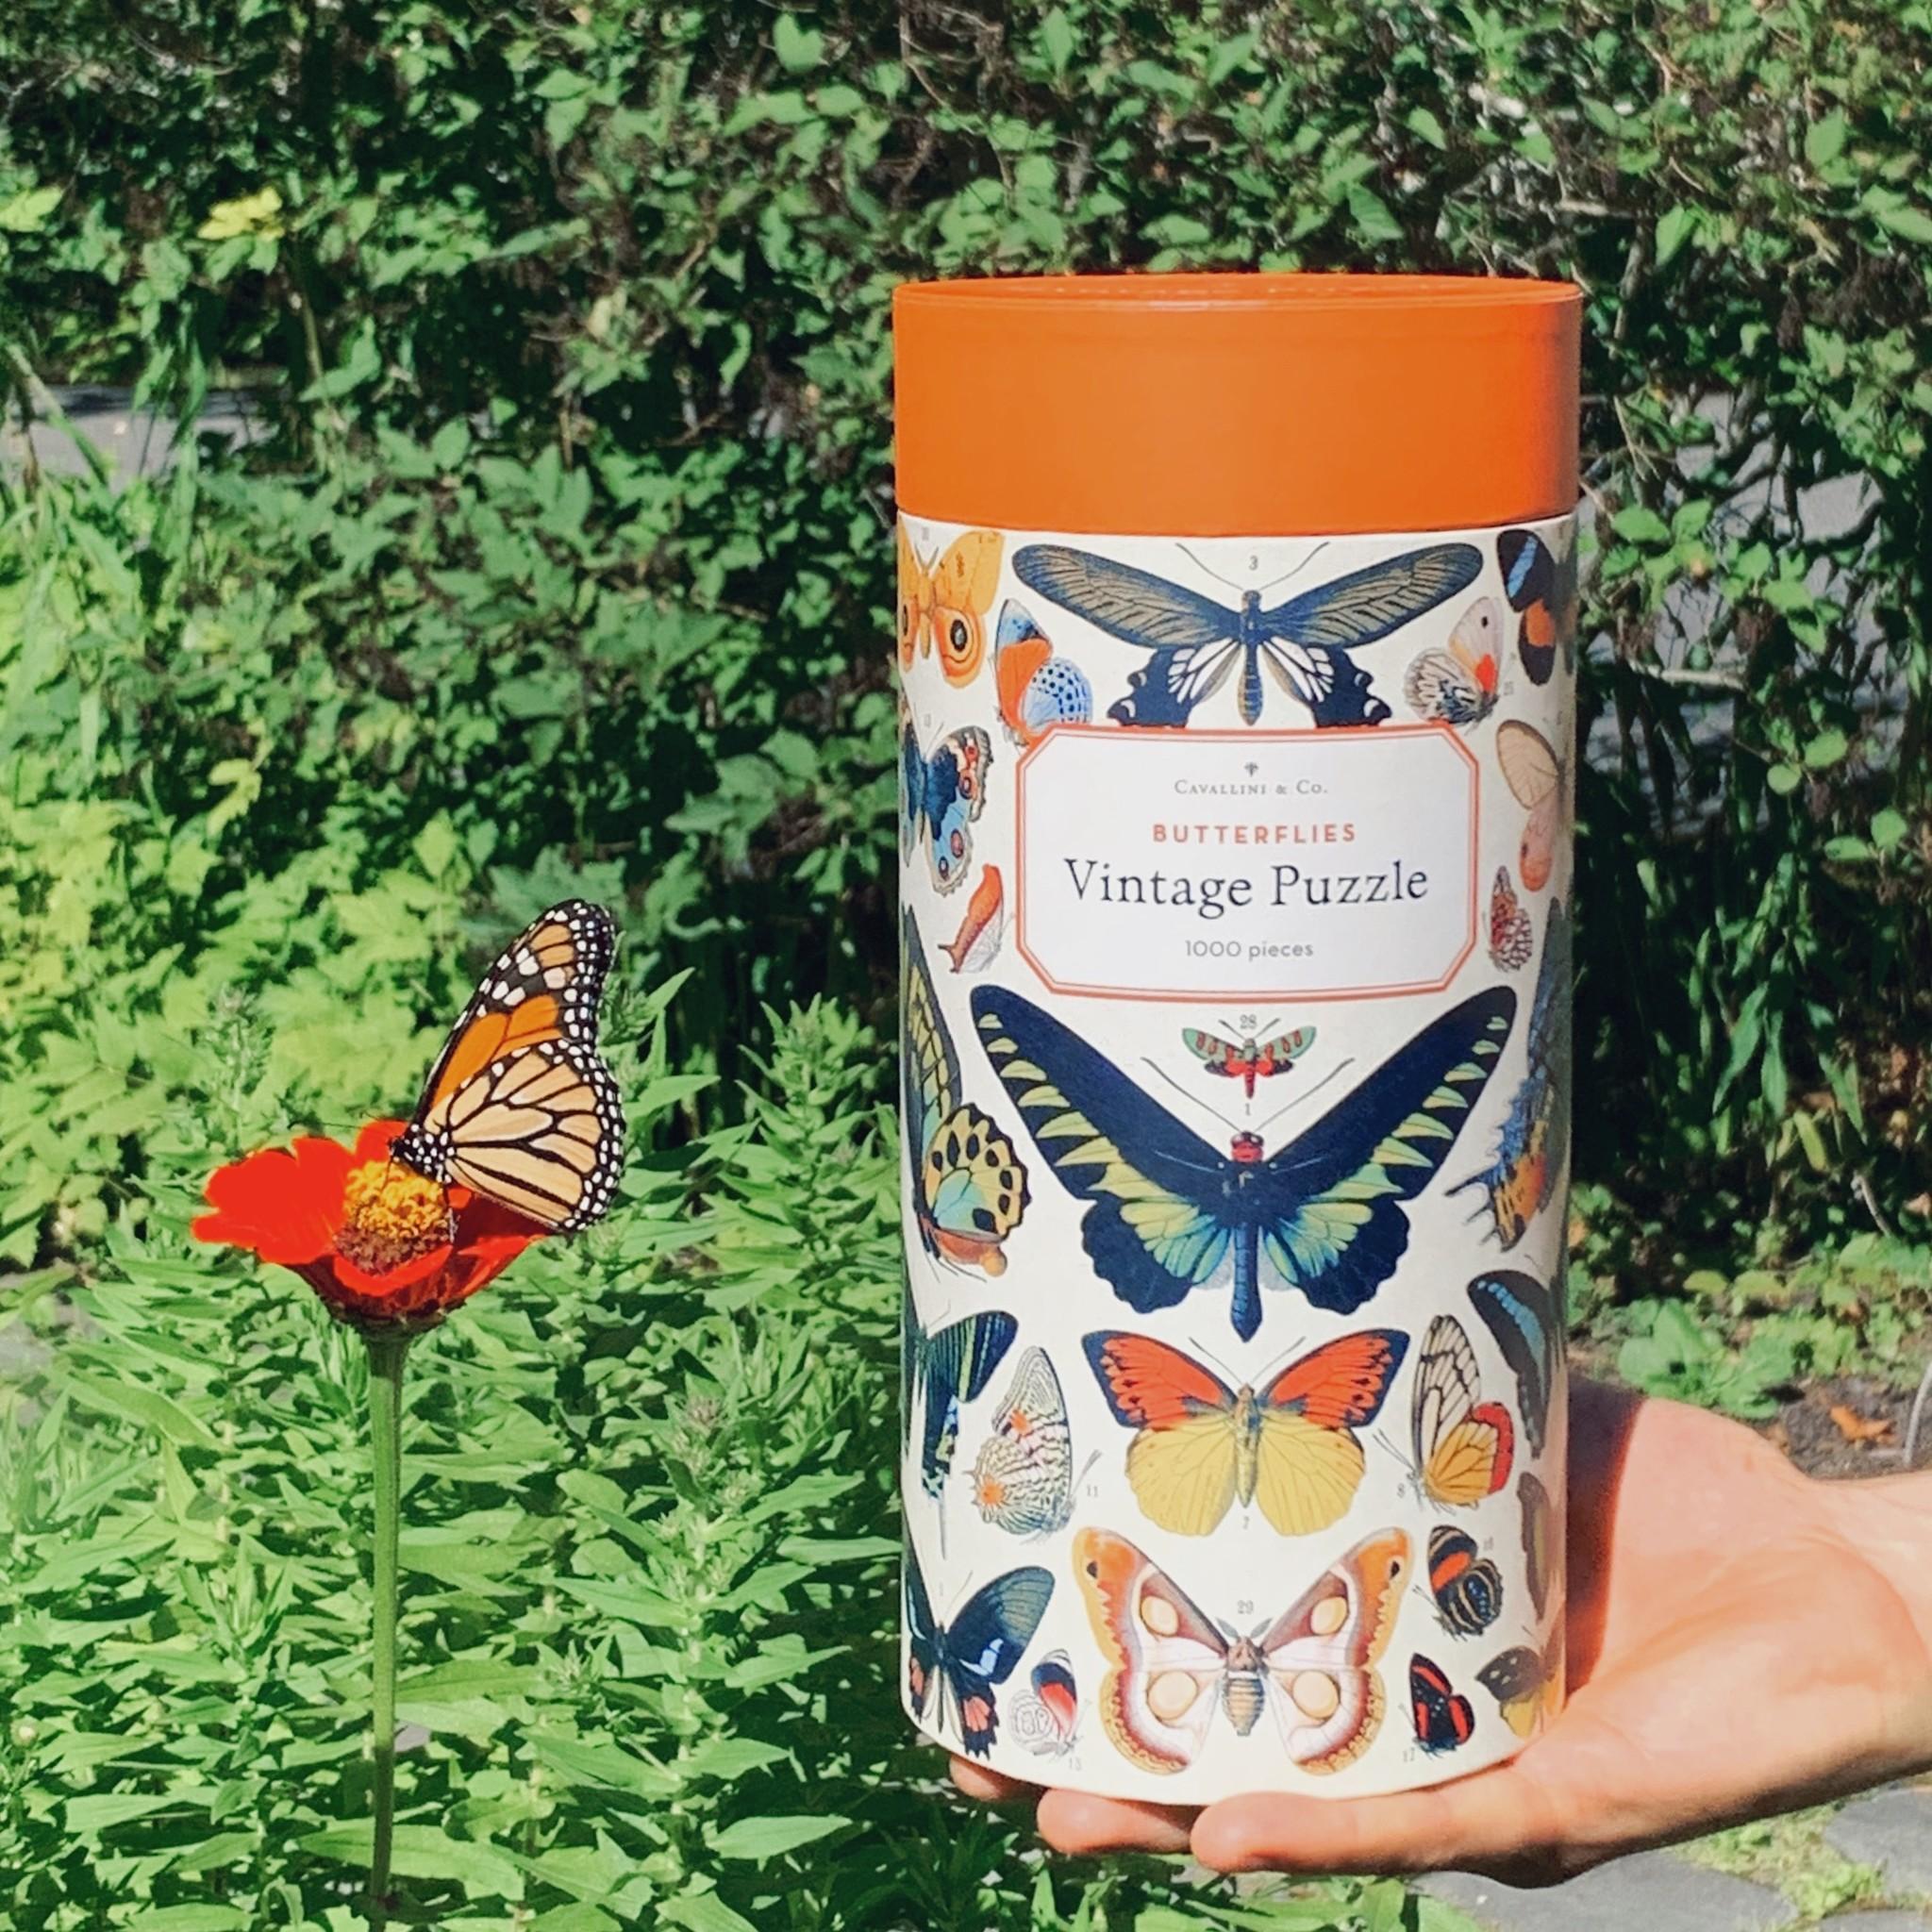 Cavallini Jigsaw Puzzle - Butterflies - 1000 Pieces